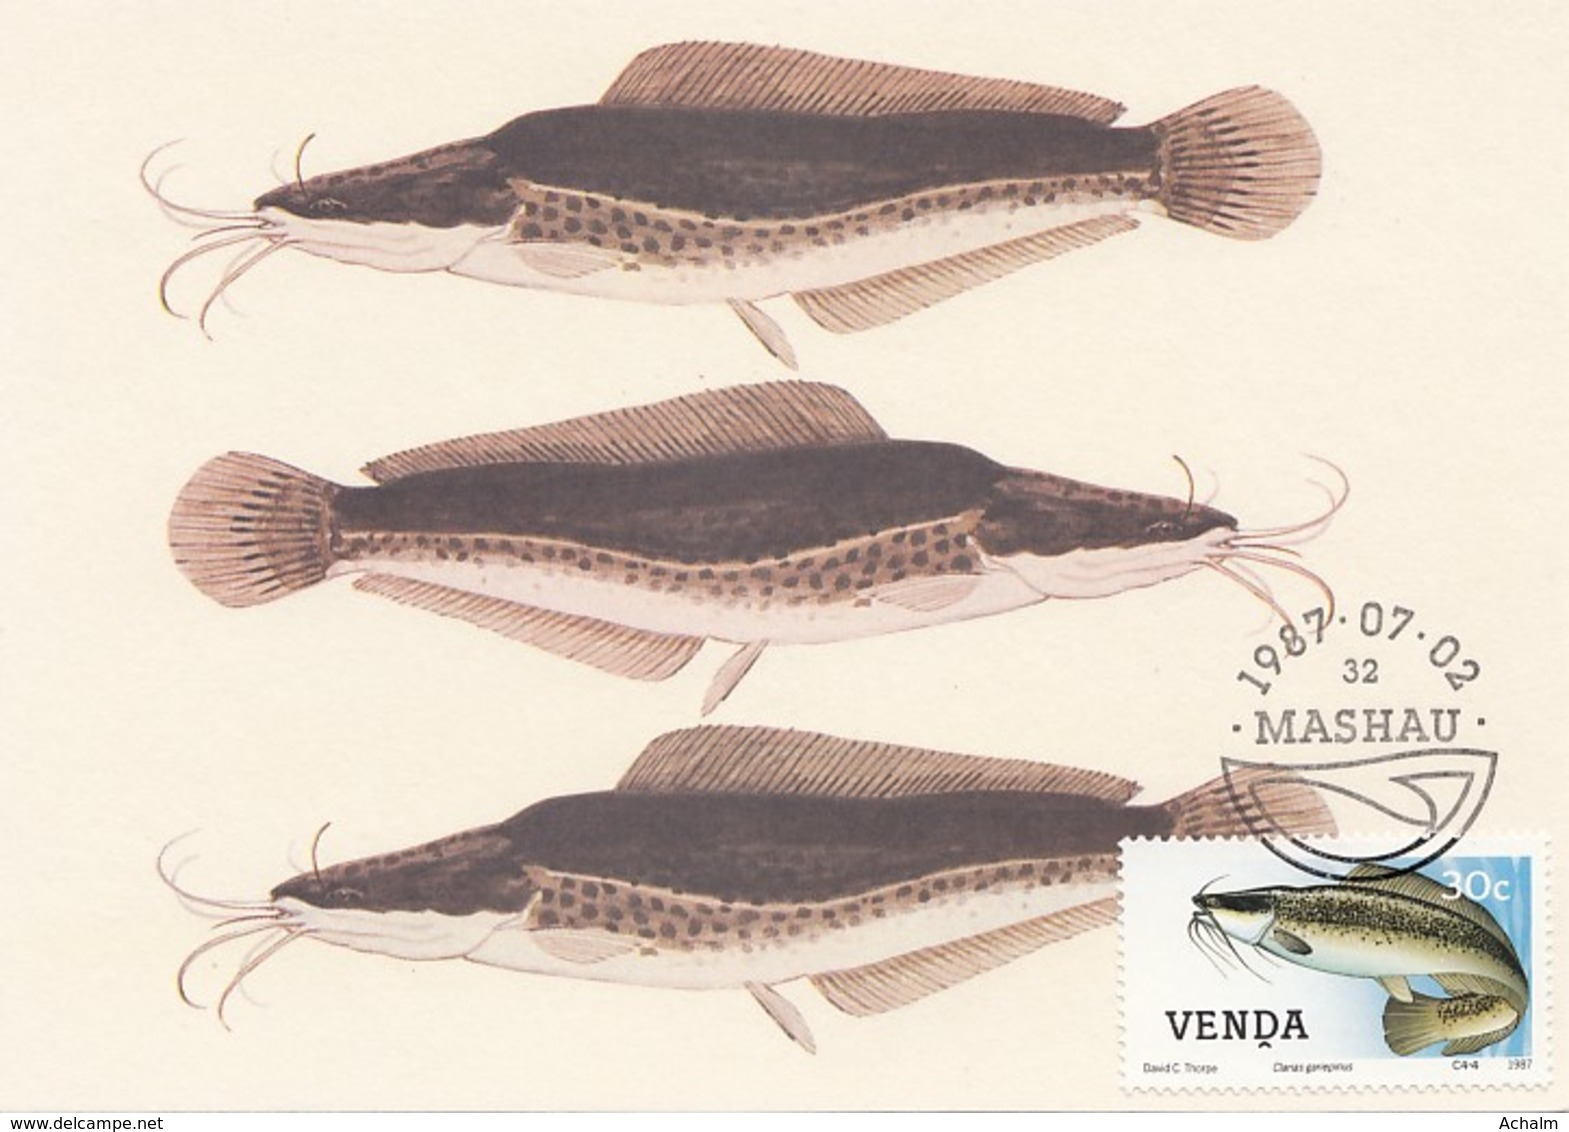 Venda - Maximum Card Of 1987 - MiNr. 162 - Freshwater Fish - Clarias Gariepinus - Venda